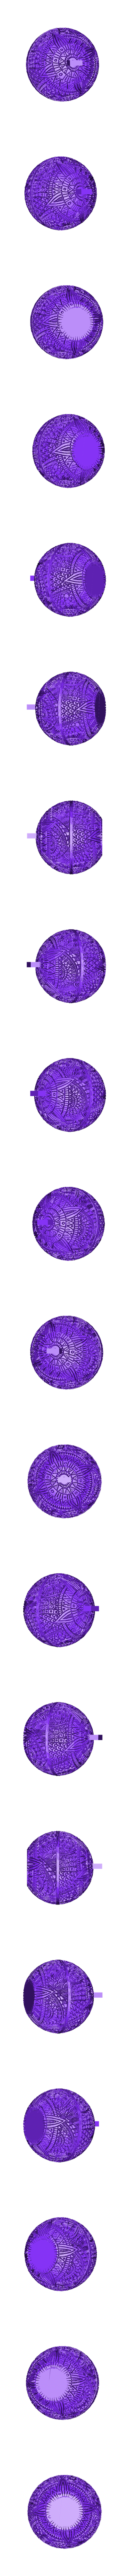 mandala sphere noel.stl Download free STL file christmas ball 5 • 3D printing model, Motek3D